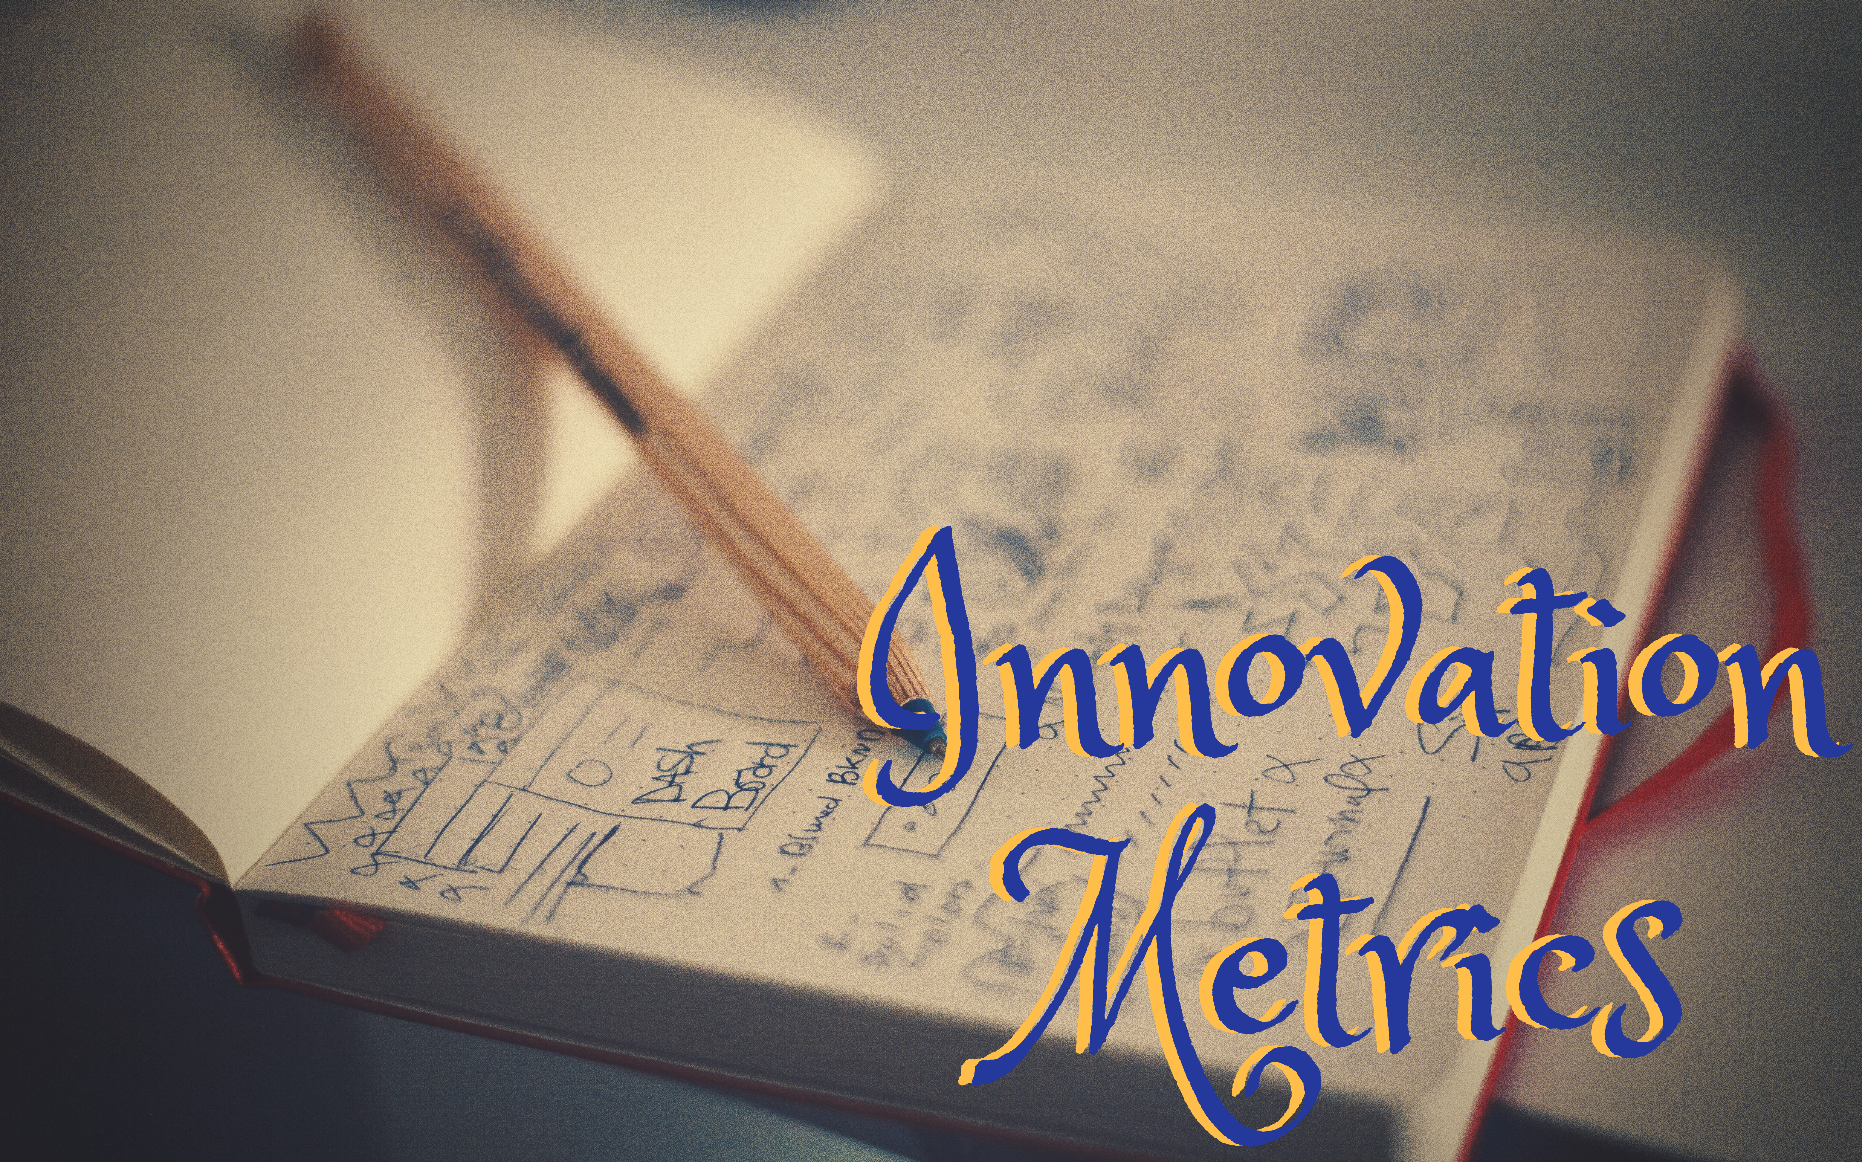 Innovation metrics review, Open innovation metrics, Innovation metrics framework, Innovation metrics, Metrics for innovation